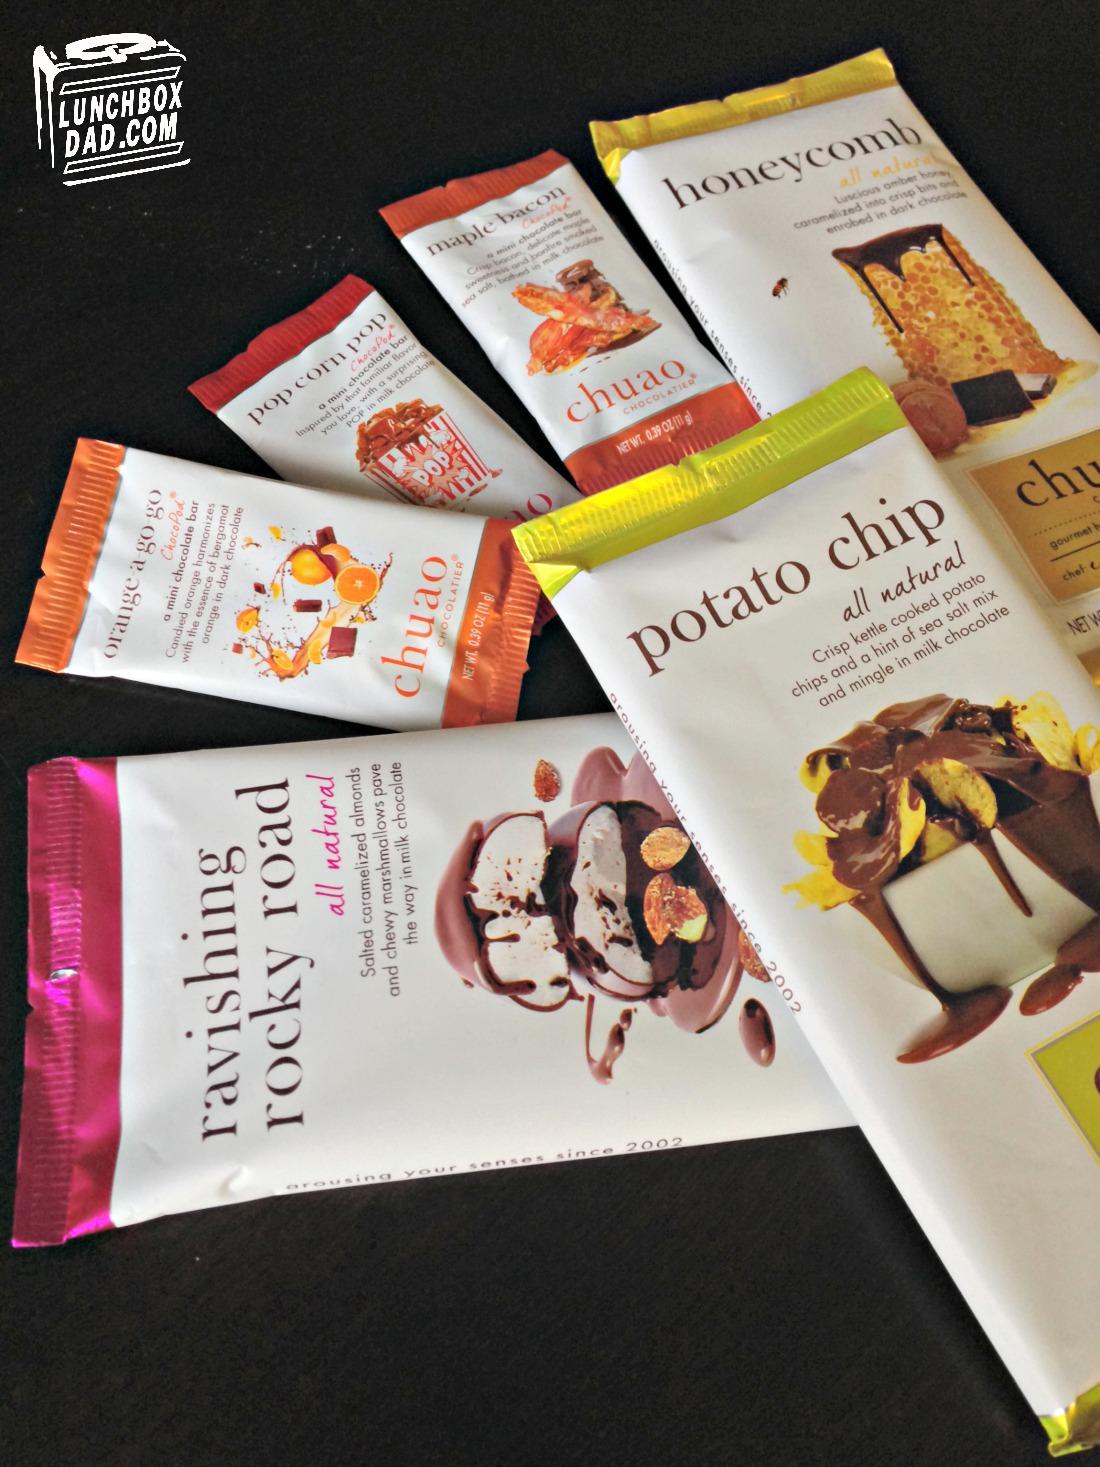 Chuao Chocolatier Chocolate review